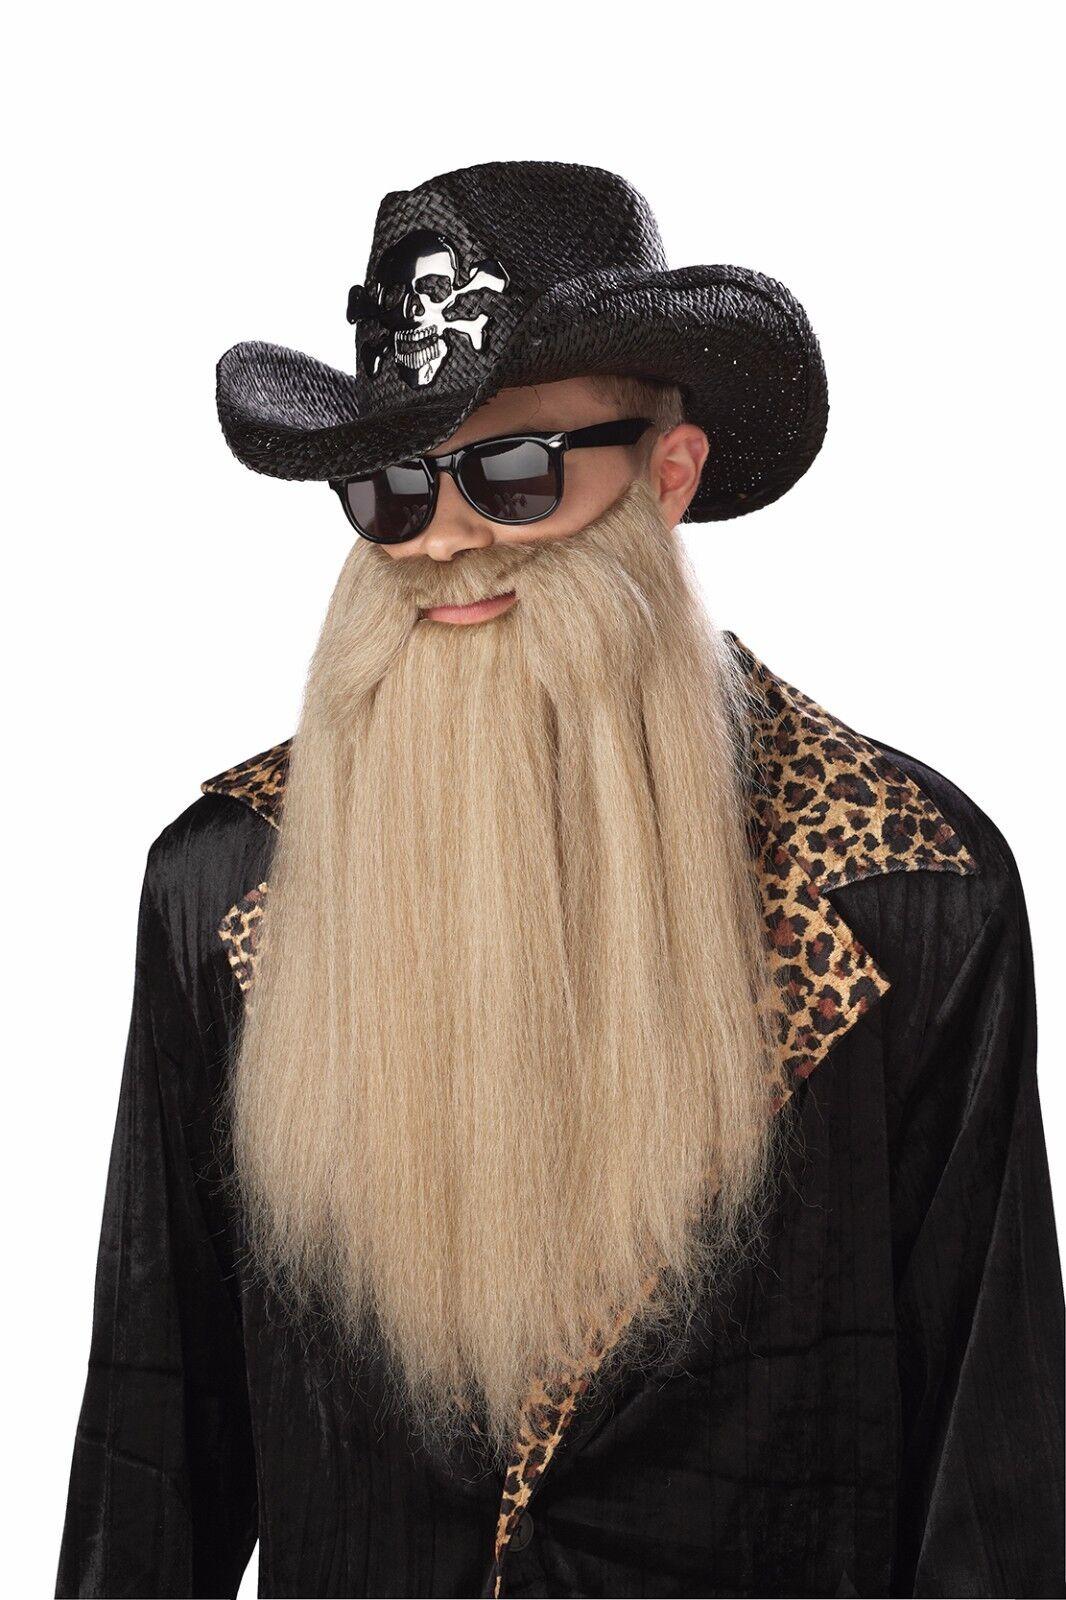 Zz Top Sharp Dressed Man Zz Top Duck Hunter Costume Beard Accessory Ebay